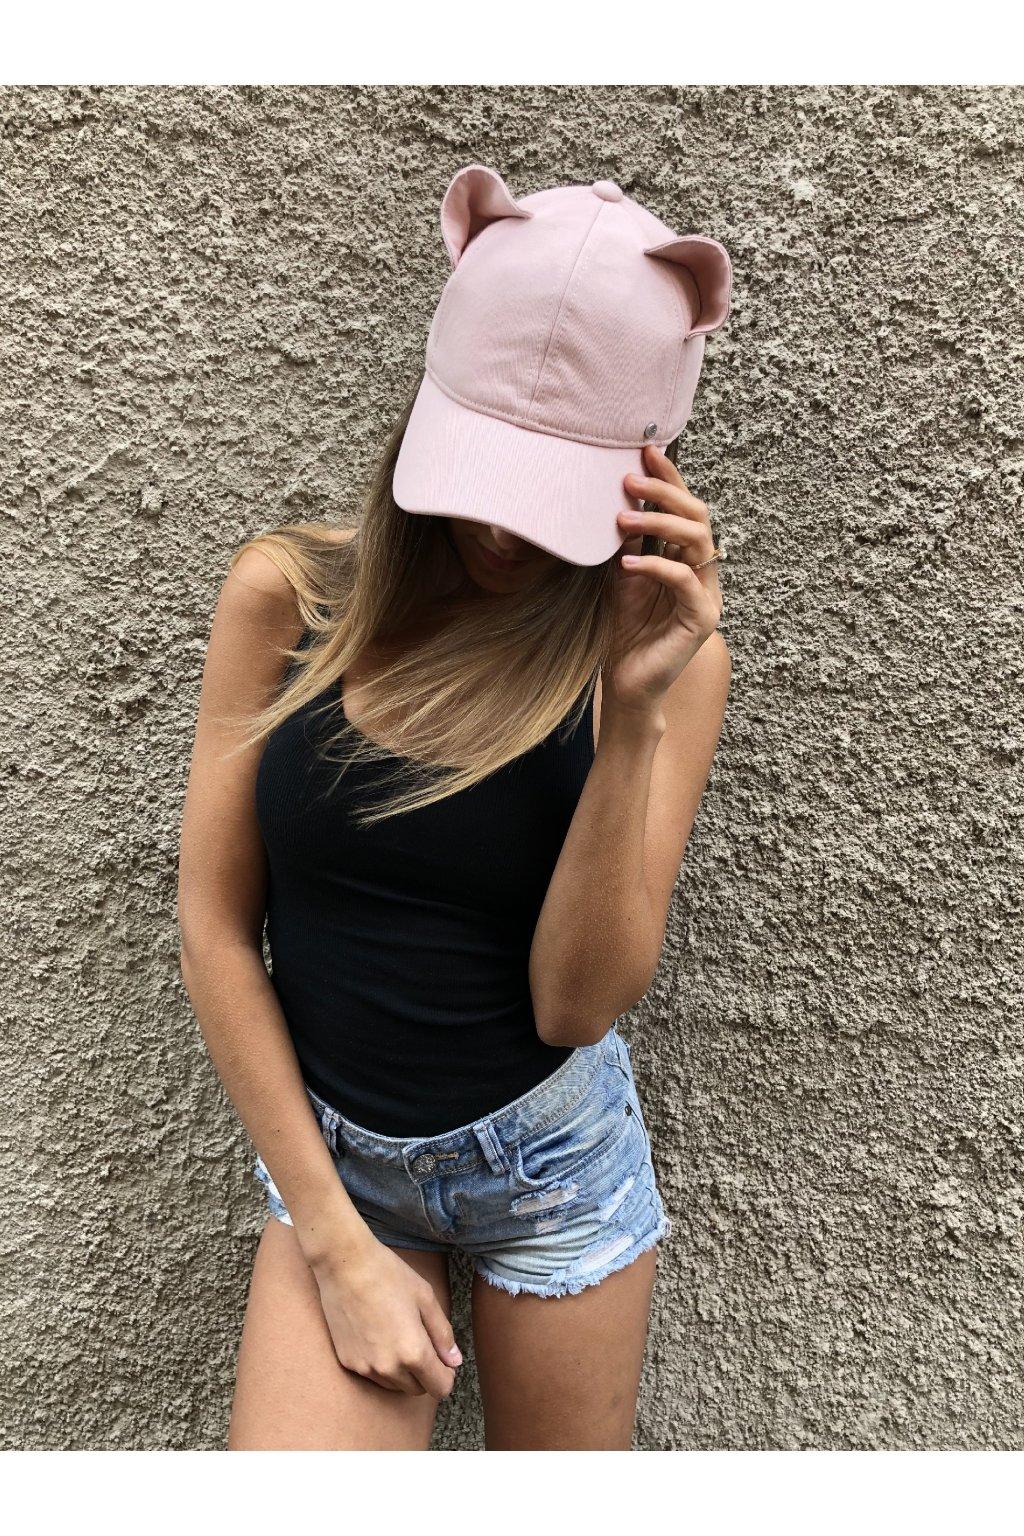 damska ksiltovka karl lagerfeld powder pink eshopat cz 1